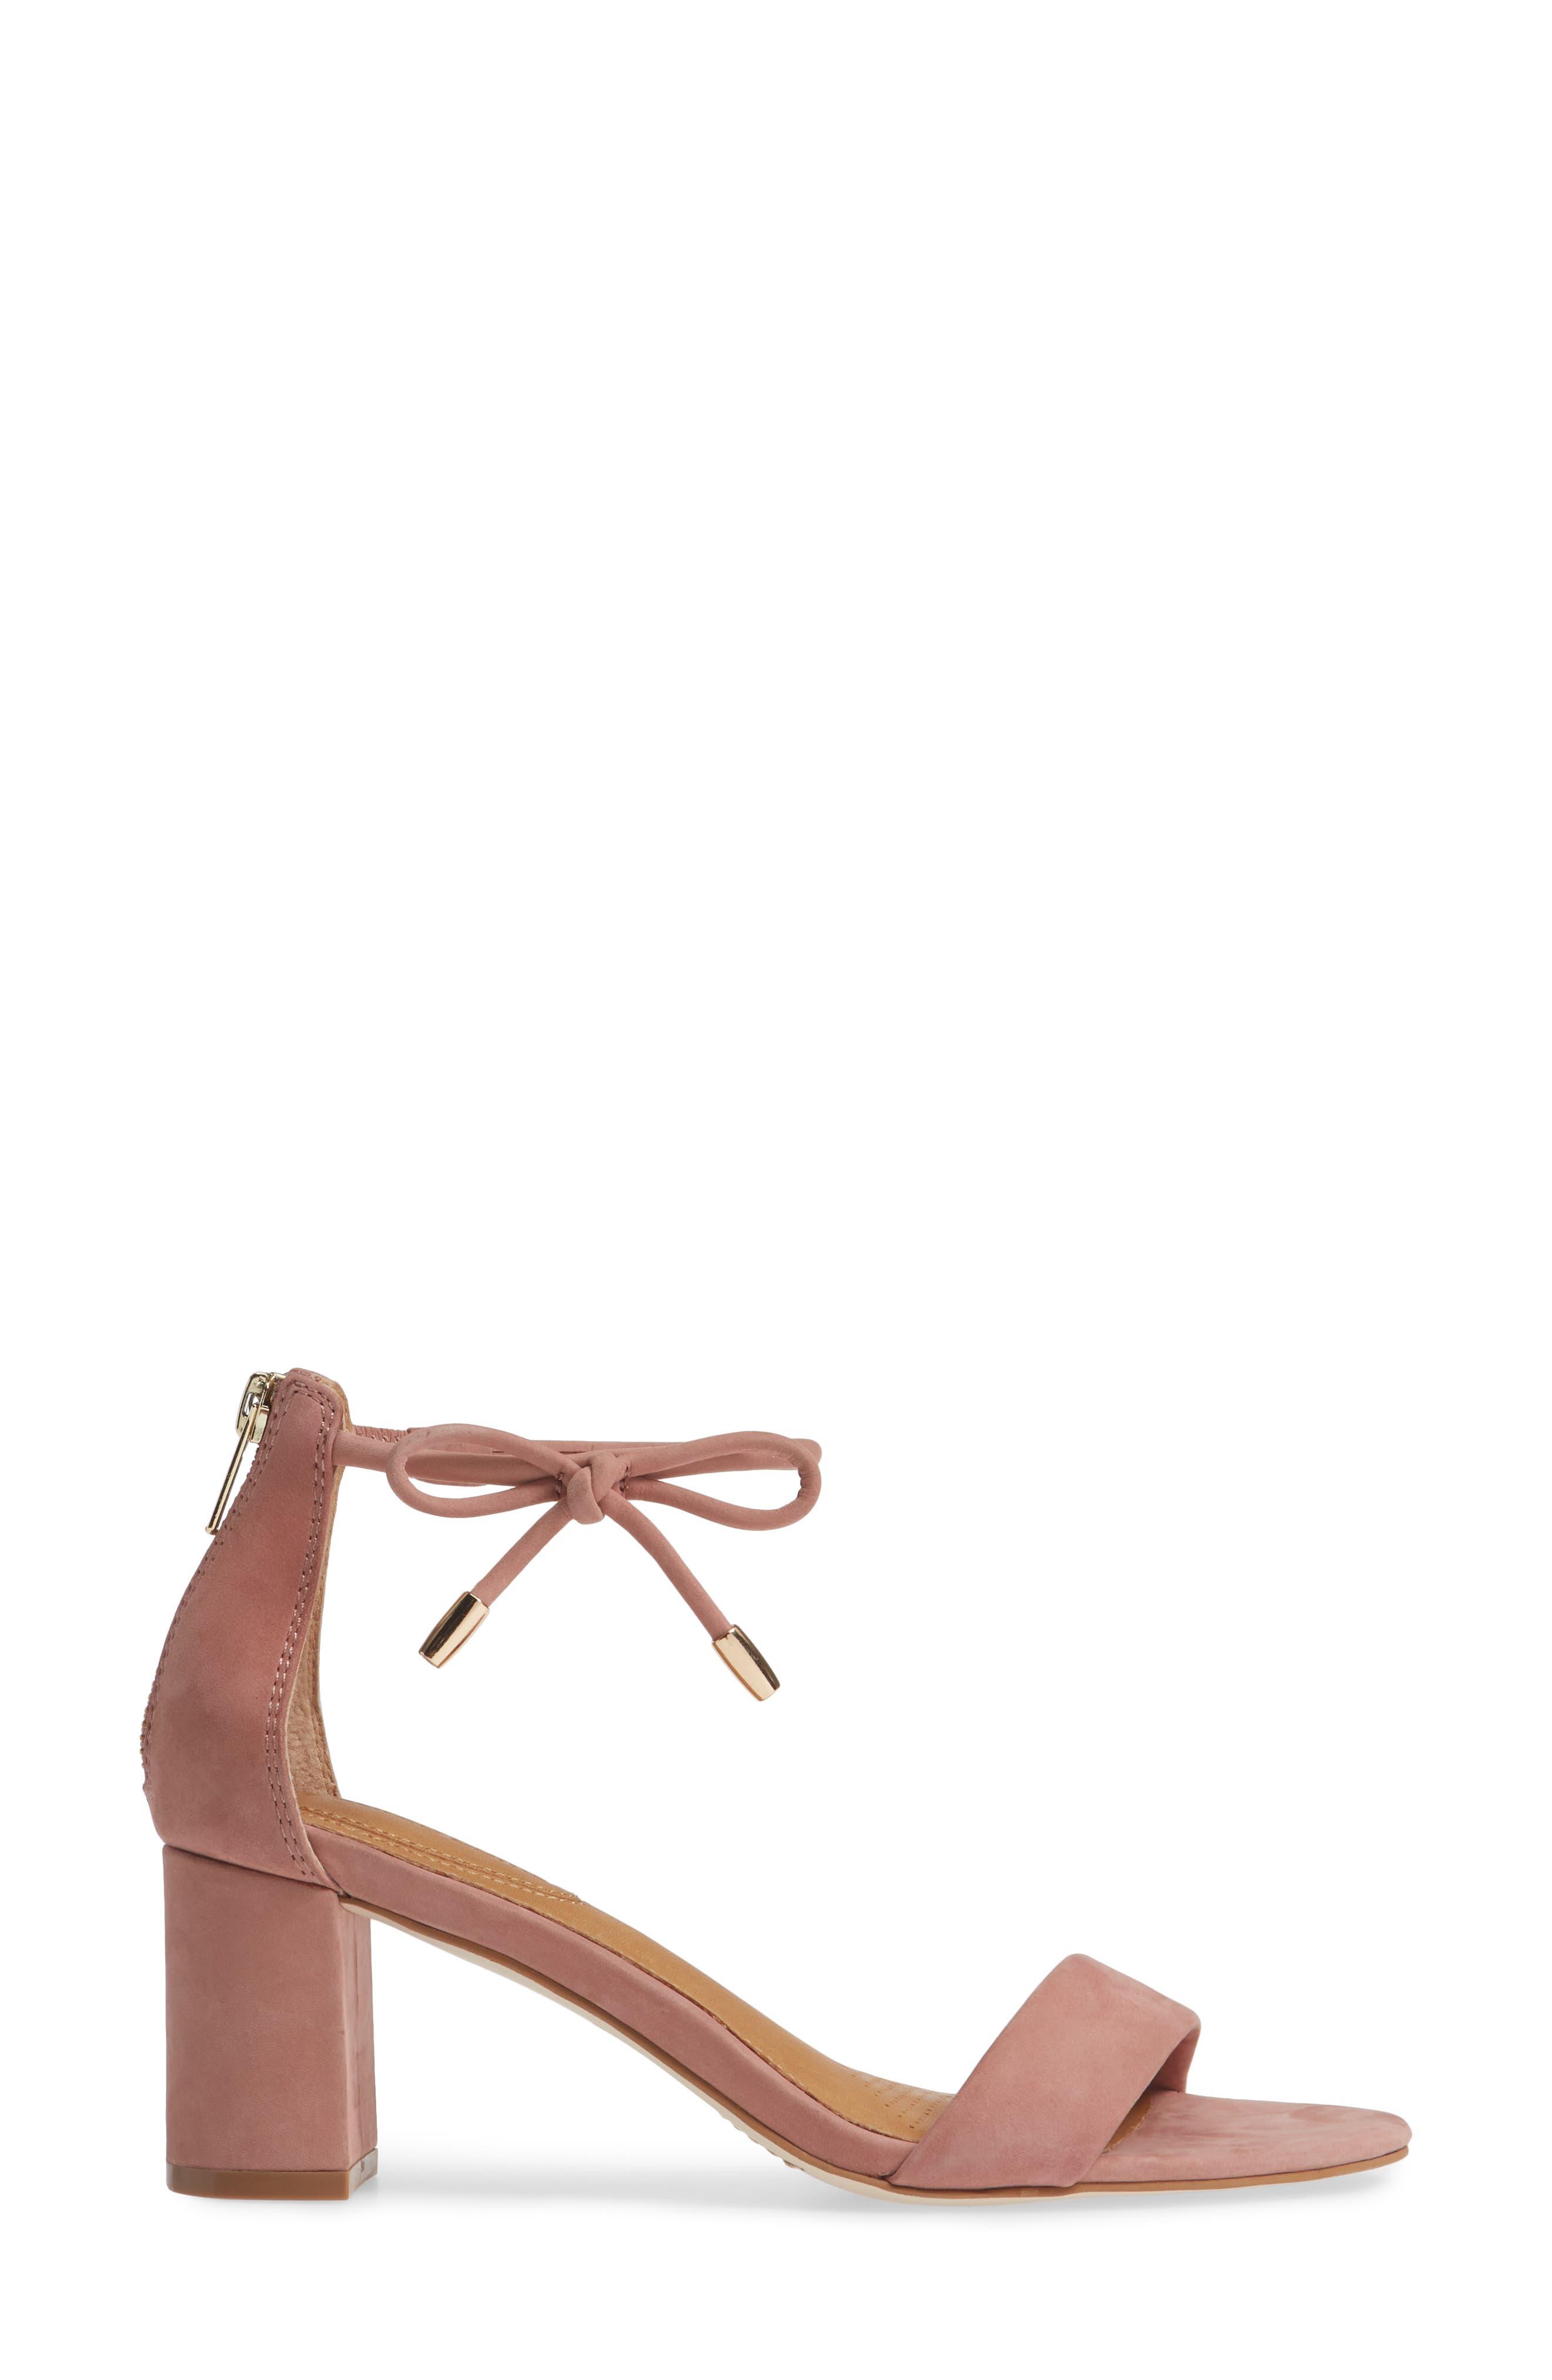 Celebratt Ankle Strap Sandal,                             Alternate thumbnail 3, color,                             OLD ROSE NUBUCK LEATHER